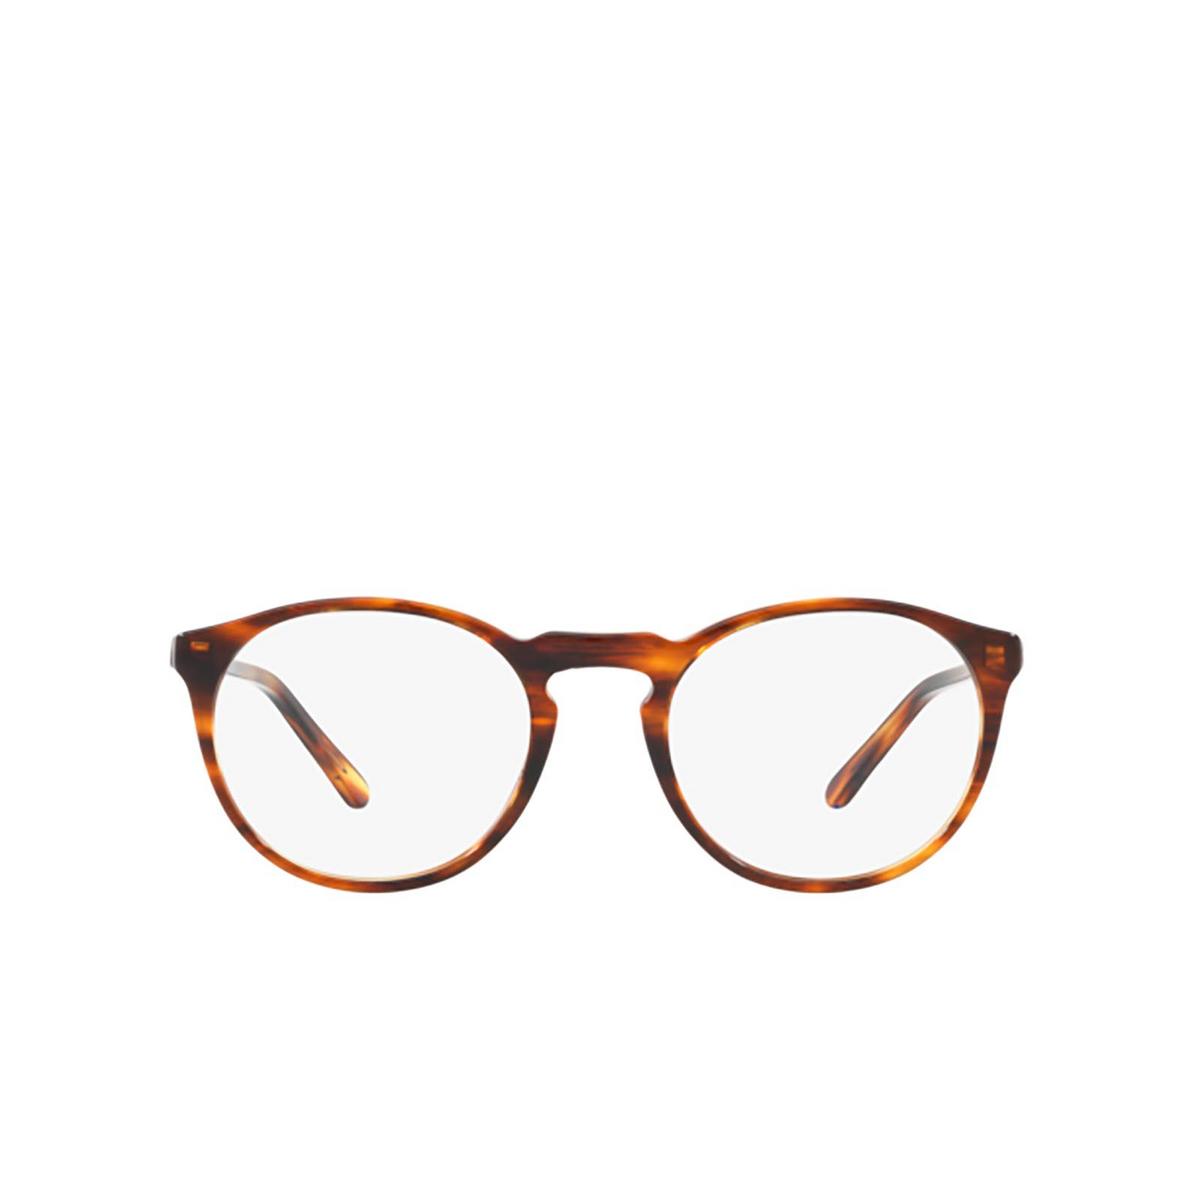 Polo Ralph Lauren® Round Eyeglasses: PH2180 color Shiny Striped Havana 5007 - front view.